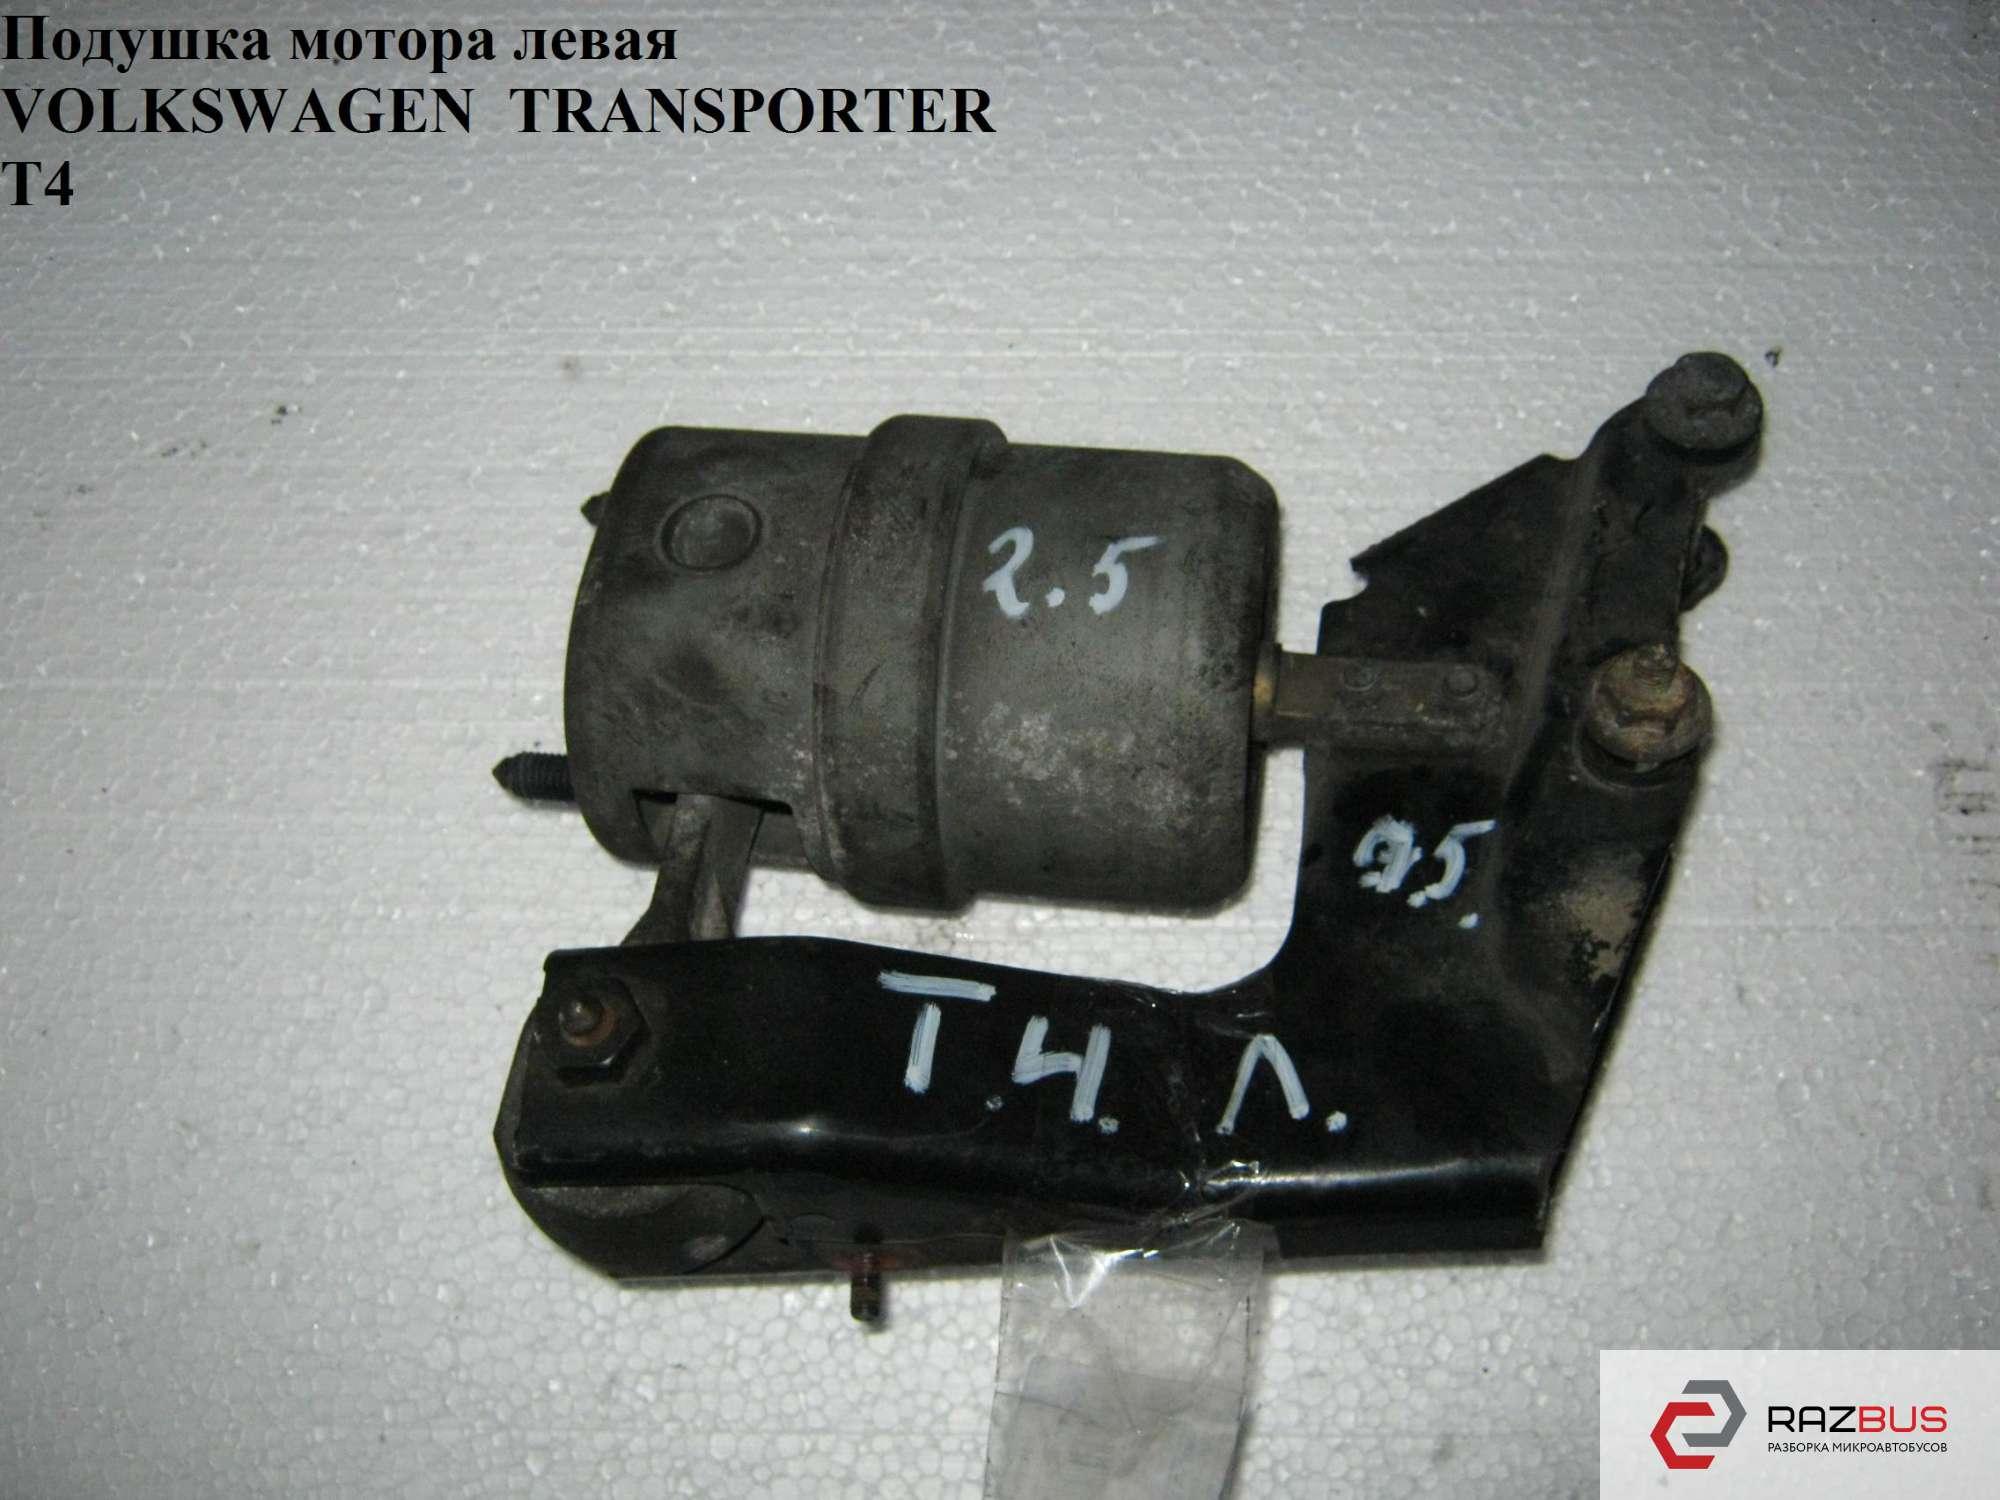 7D0399107AL Подушка мотора левая 2.5TDI VOLKSWAGEN TRANSPORTER T4 1990-2003г